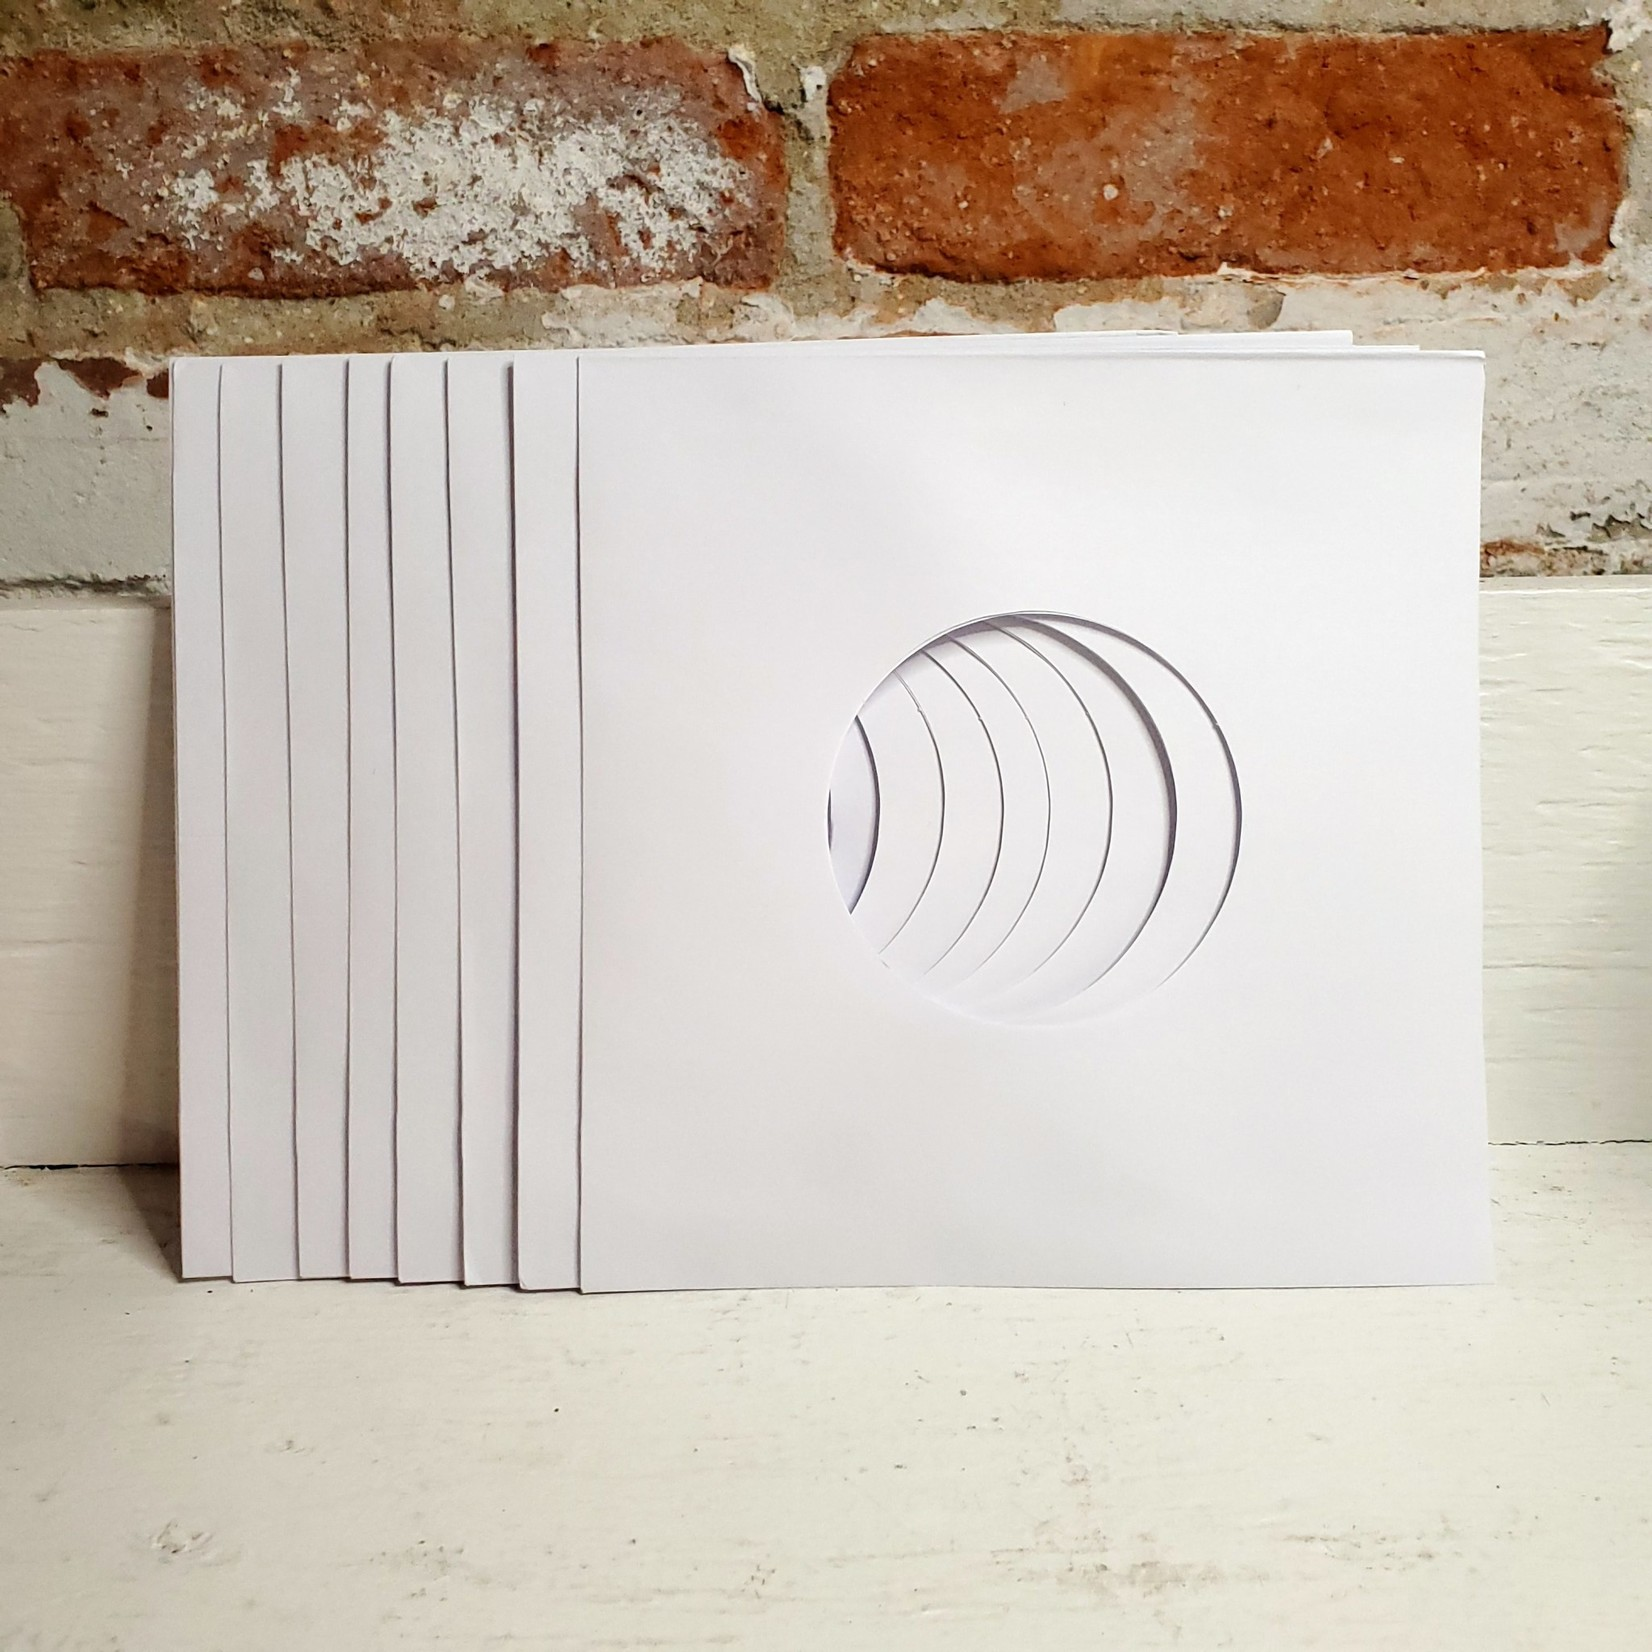 [Accessories] 7'' 45: Paper Sleeves (25pk)